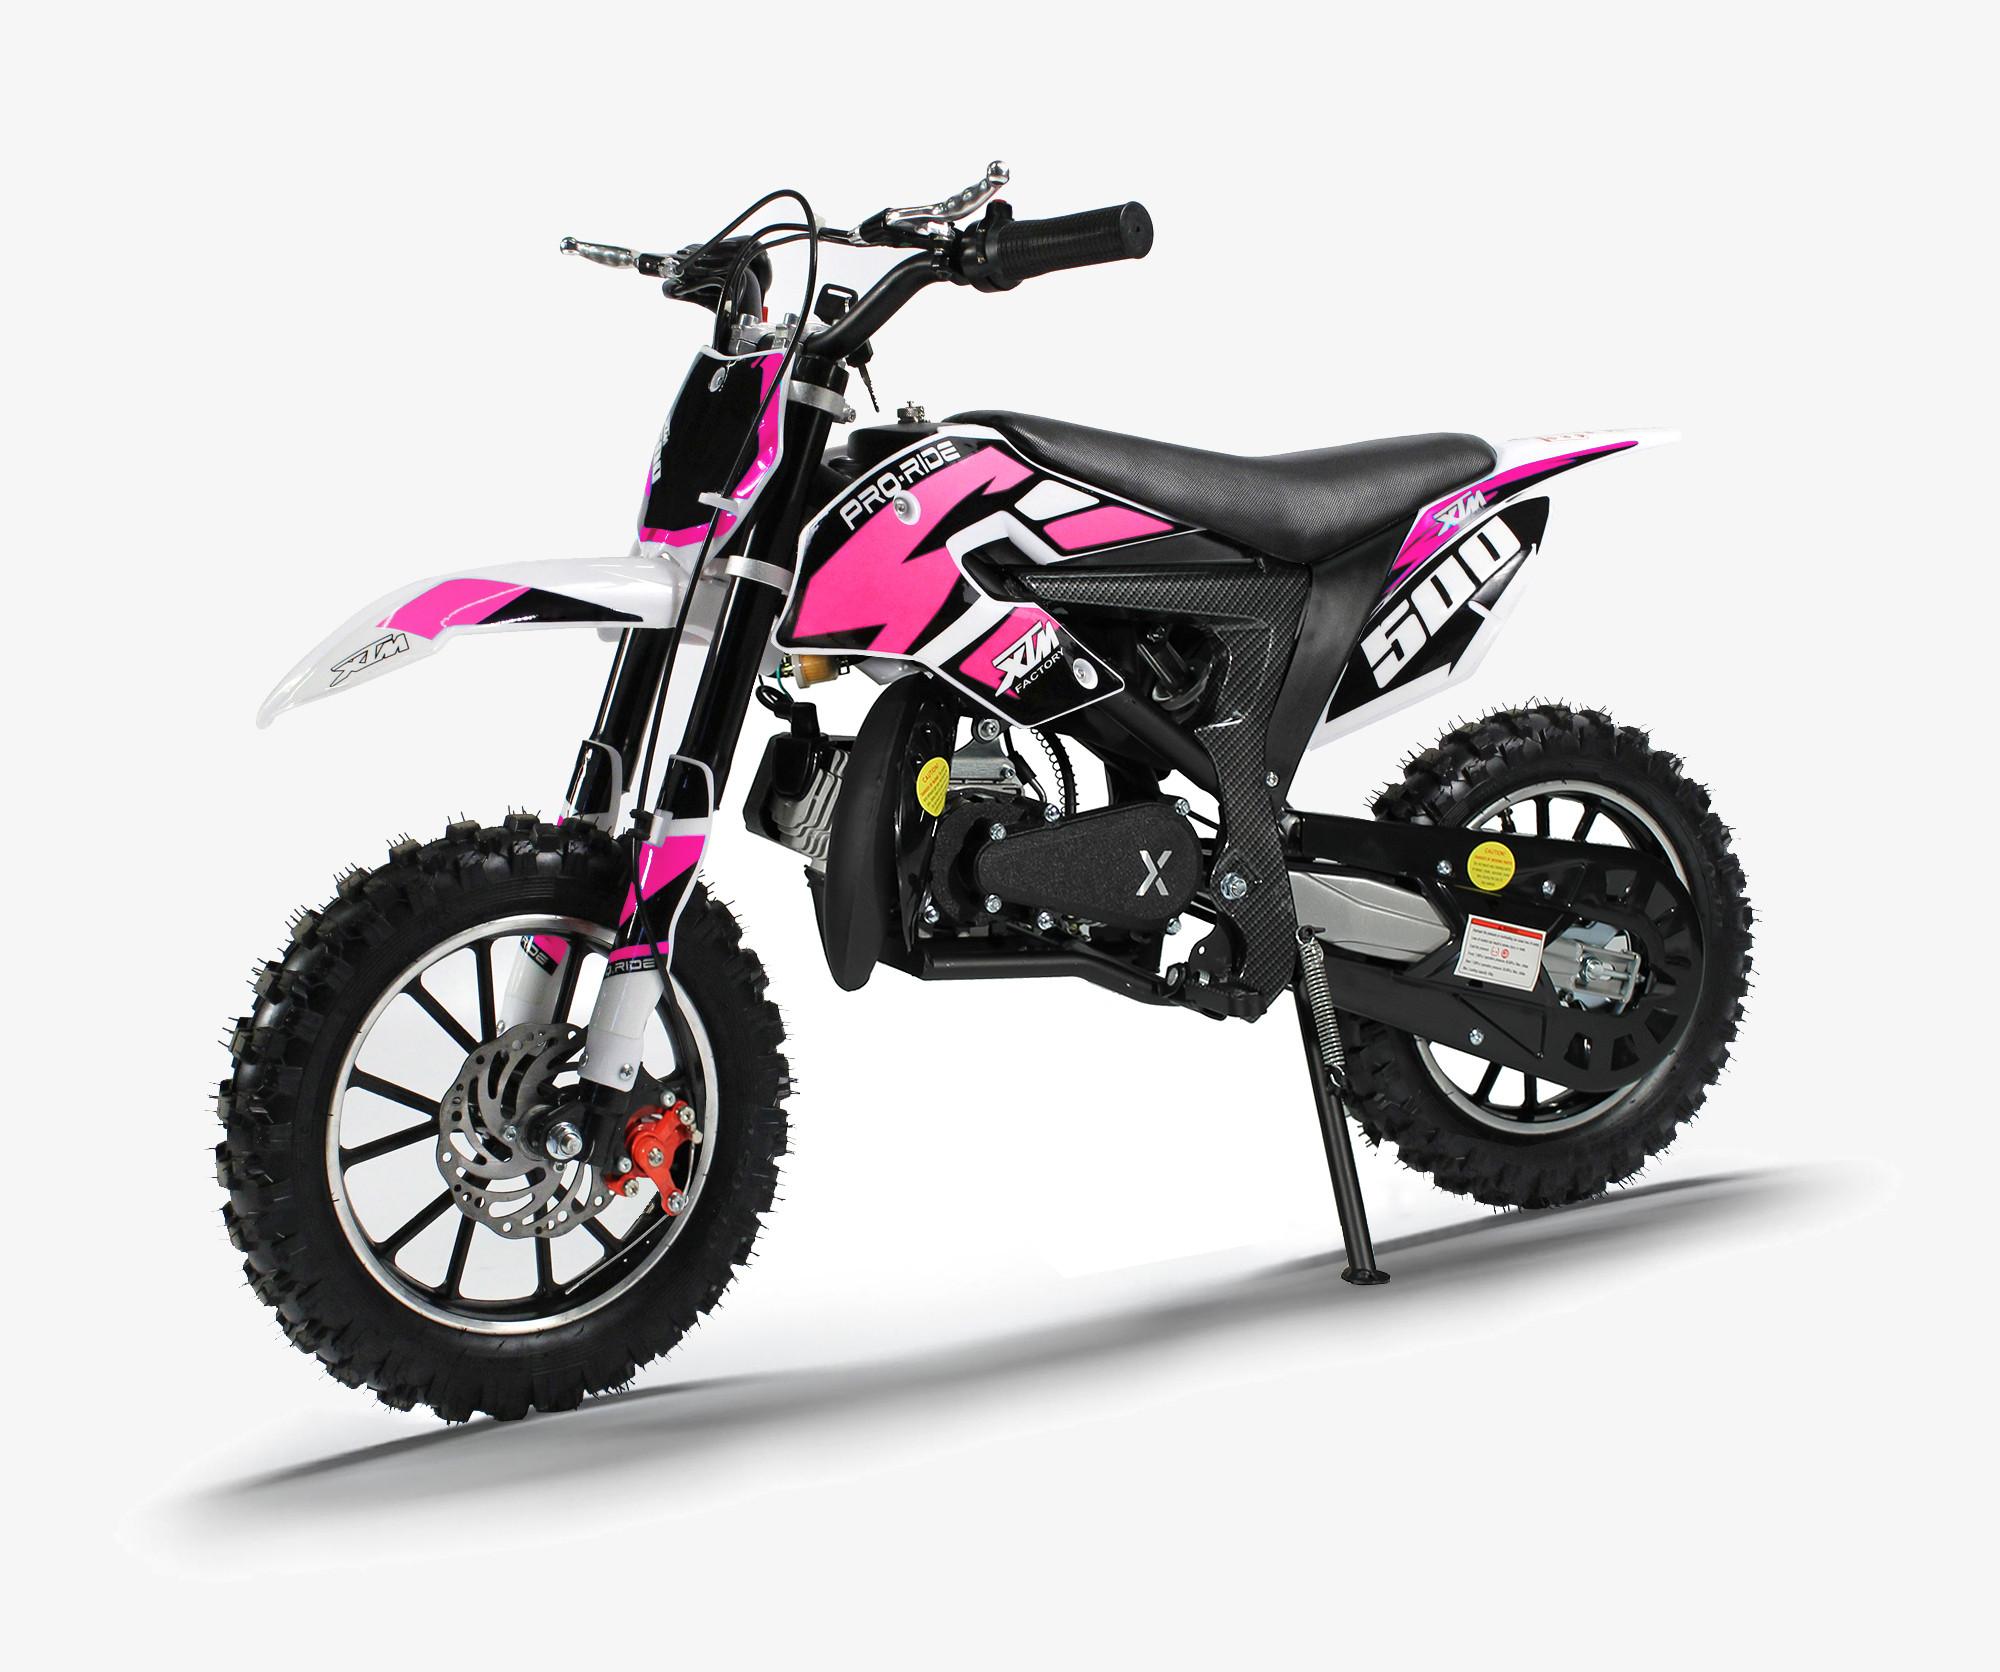 XTM PRO-RIDER 50cc DIRT BIKE BLACK PINK